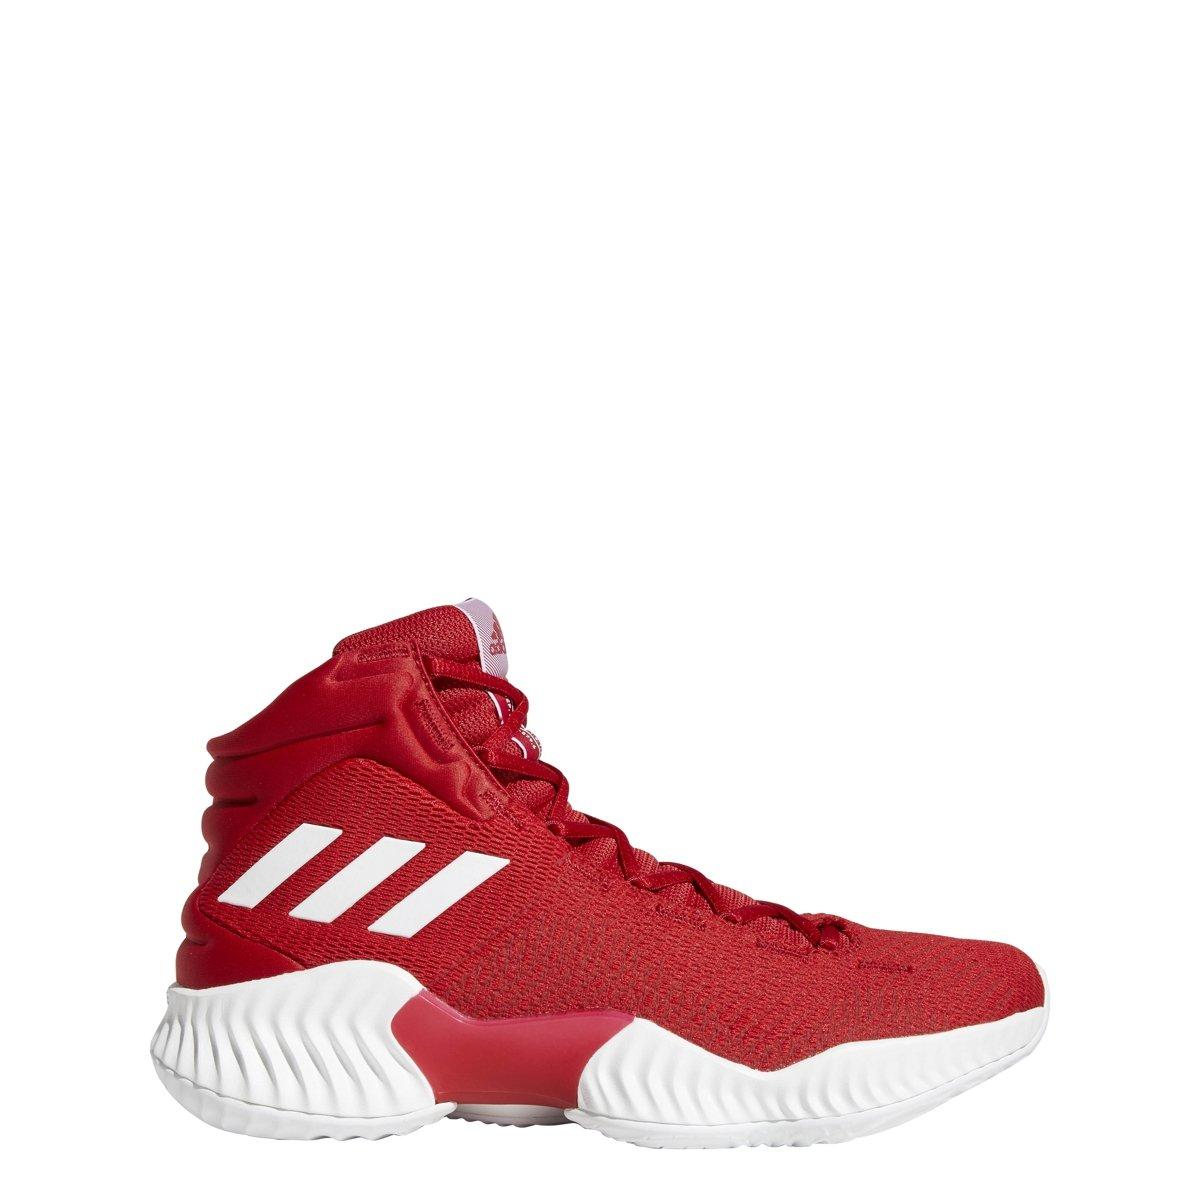 Adidas hombre 's Pro Bounce 2018 zapatilla de baloncesto b077x3rlfr 18 D (m)